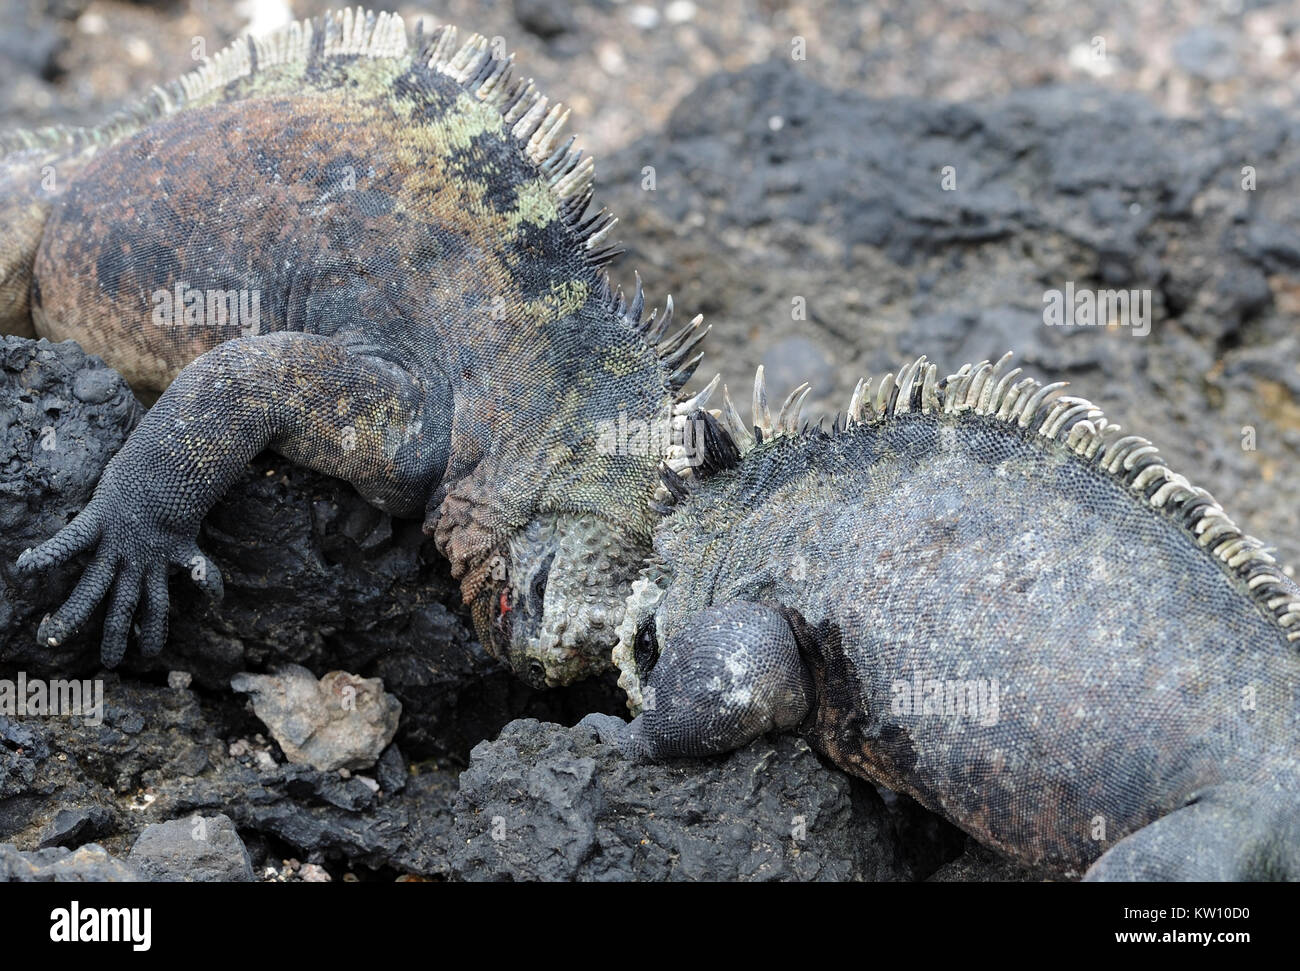 Two big male iguana or Galápagos marine iguana (Amblyrhynchus cristatus cristatus) push against each others - Stock Image